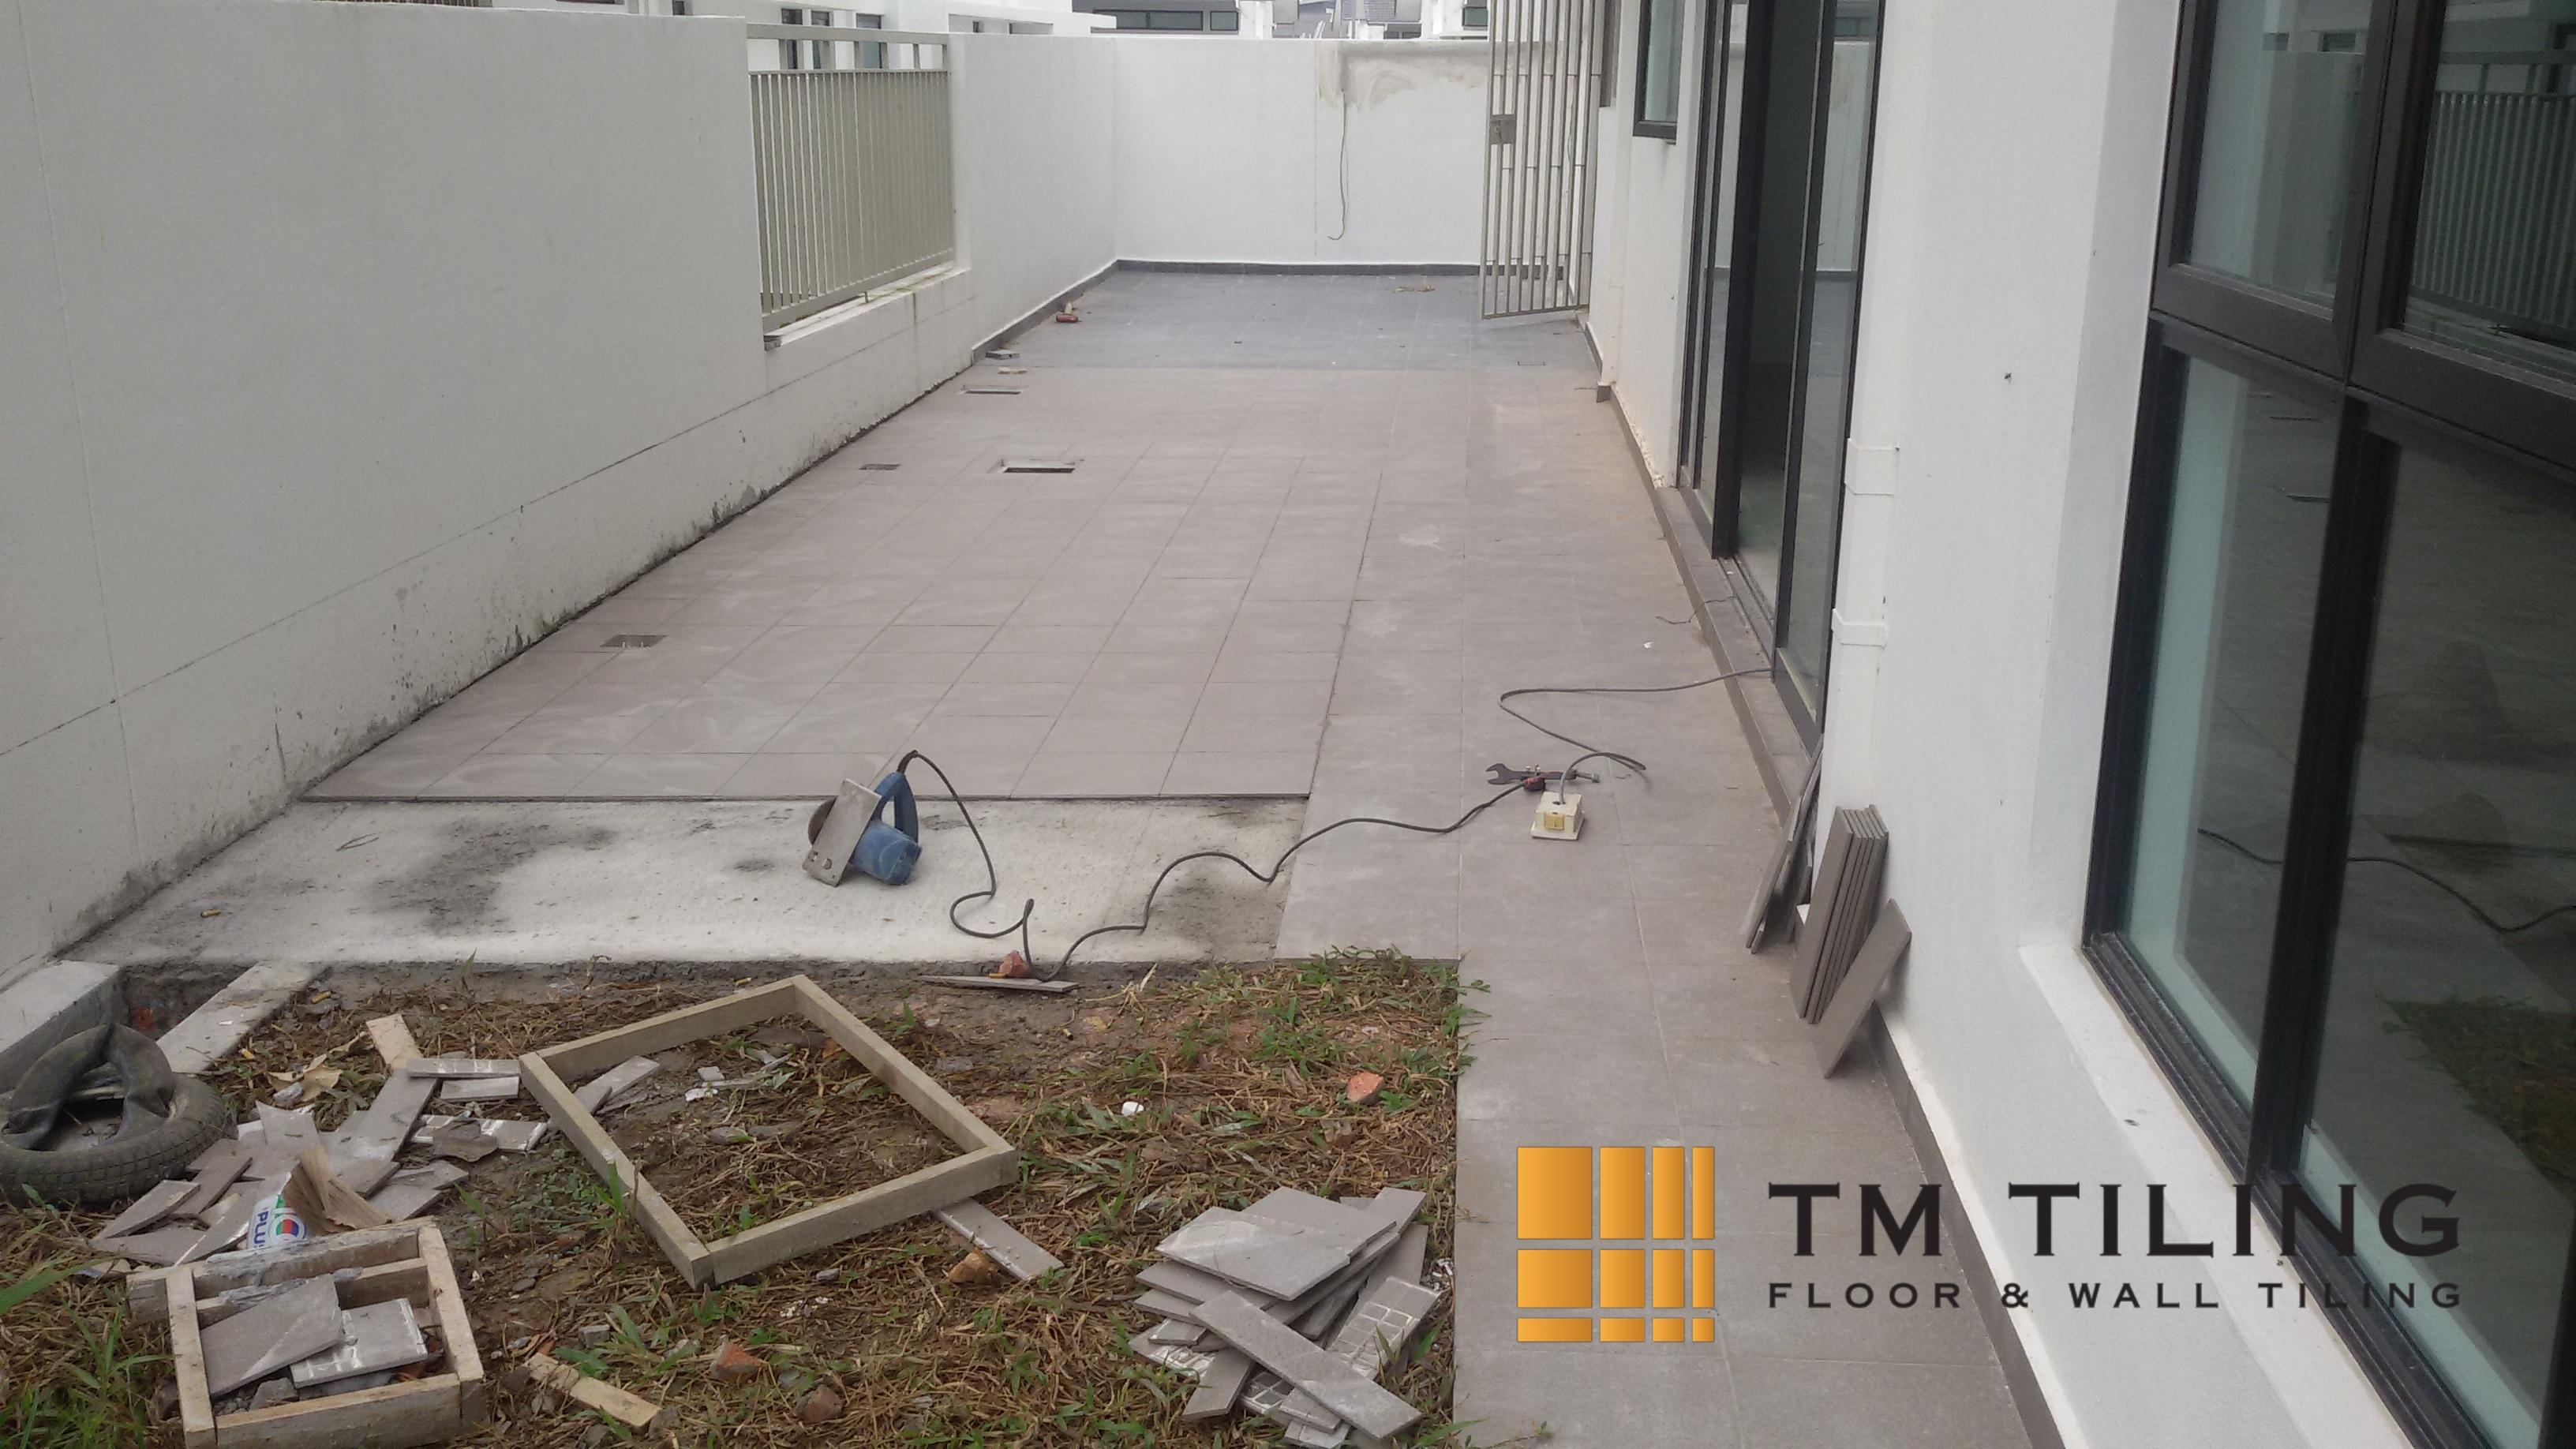 patio-tile-installation-tm-tiling-singapore-landed-marine-parade_wm